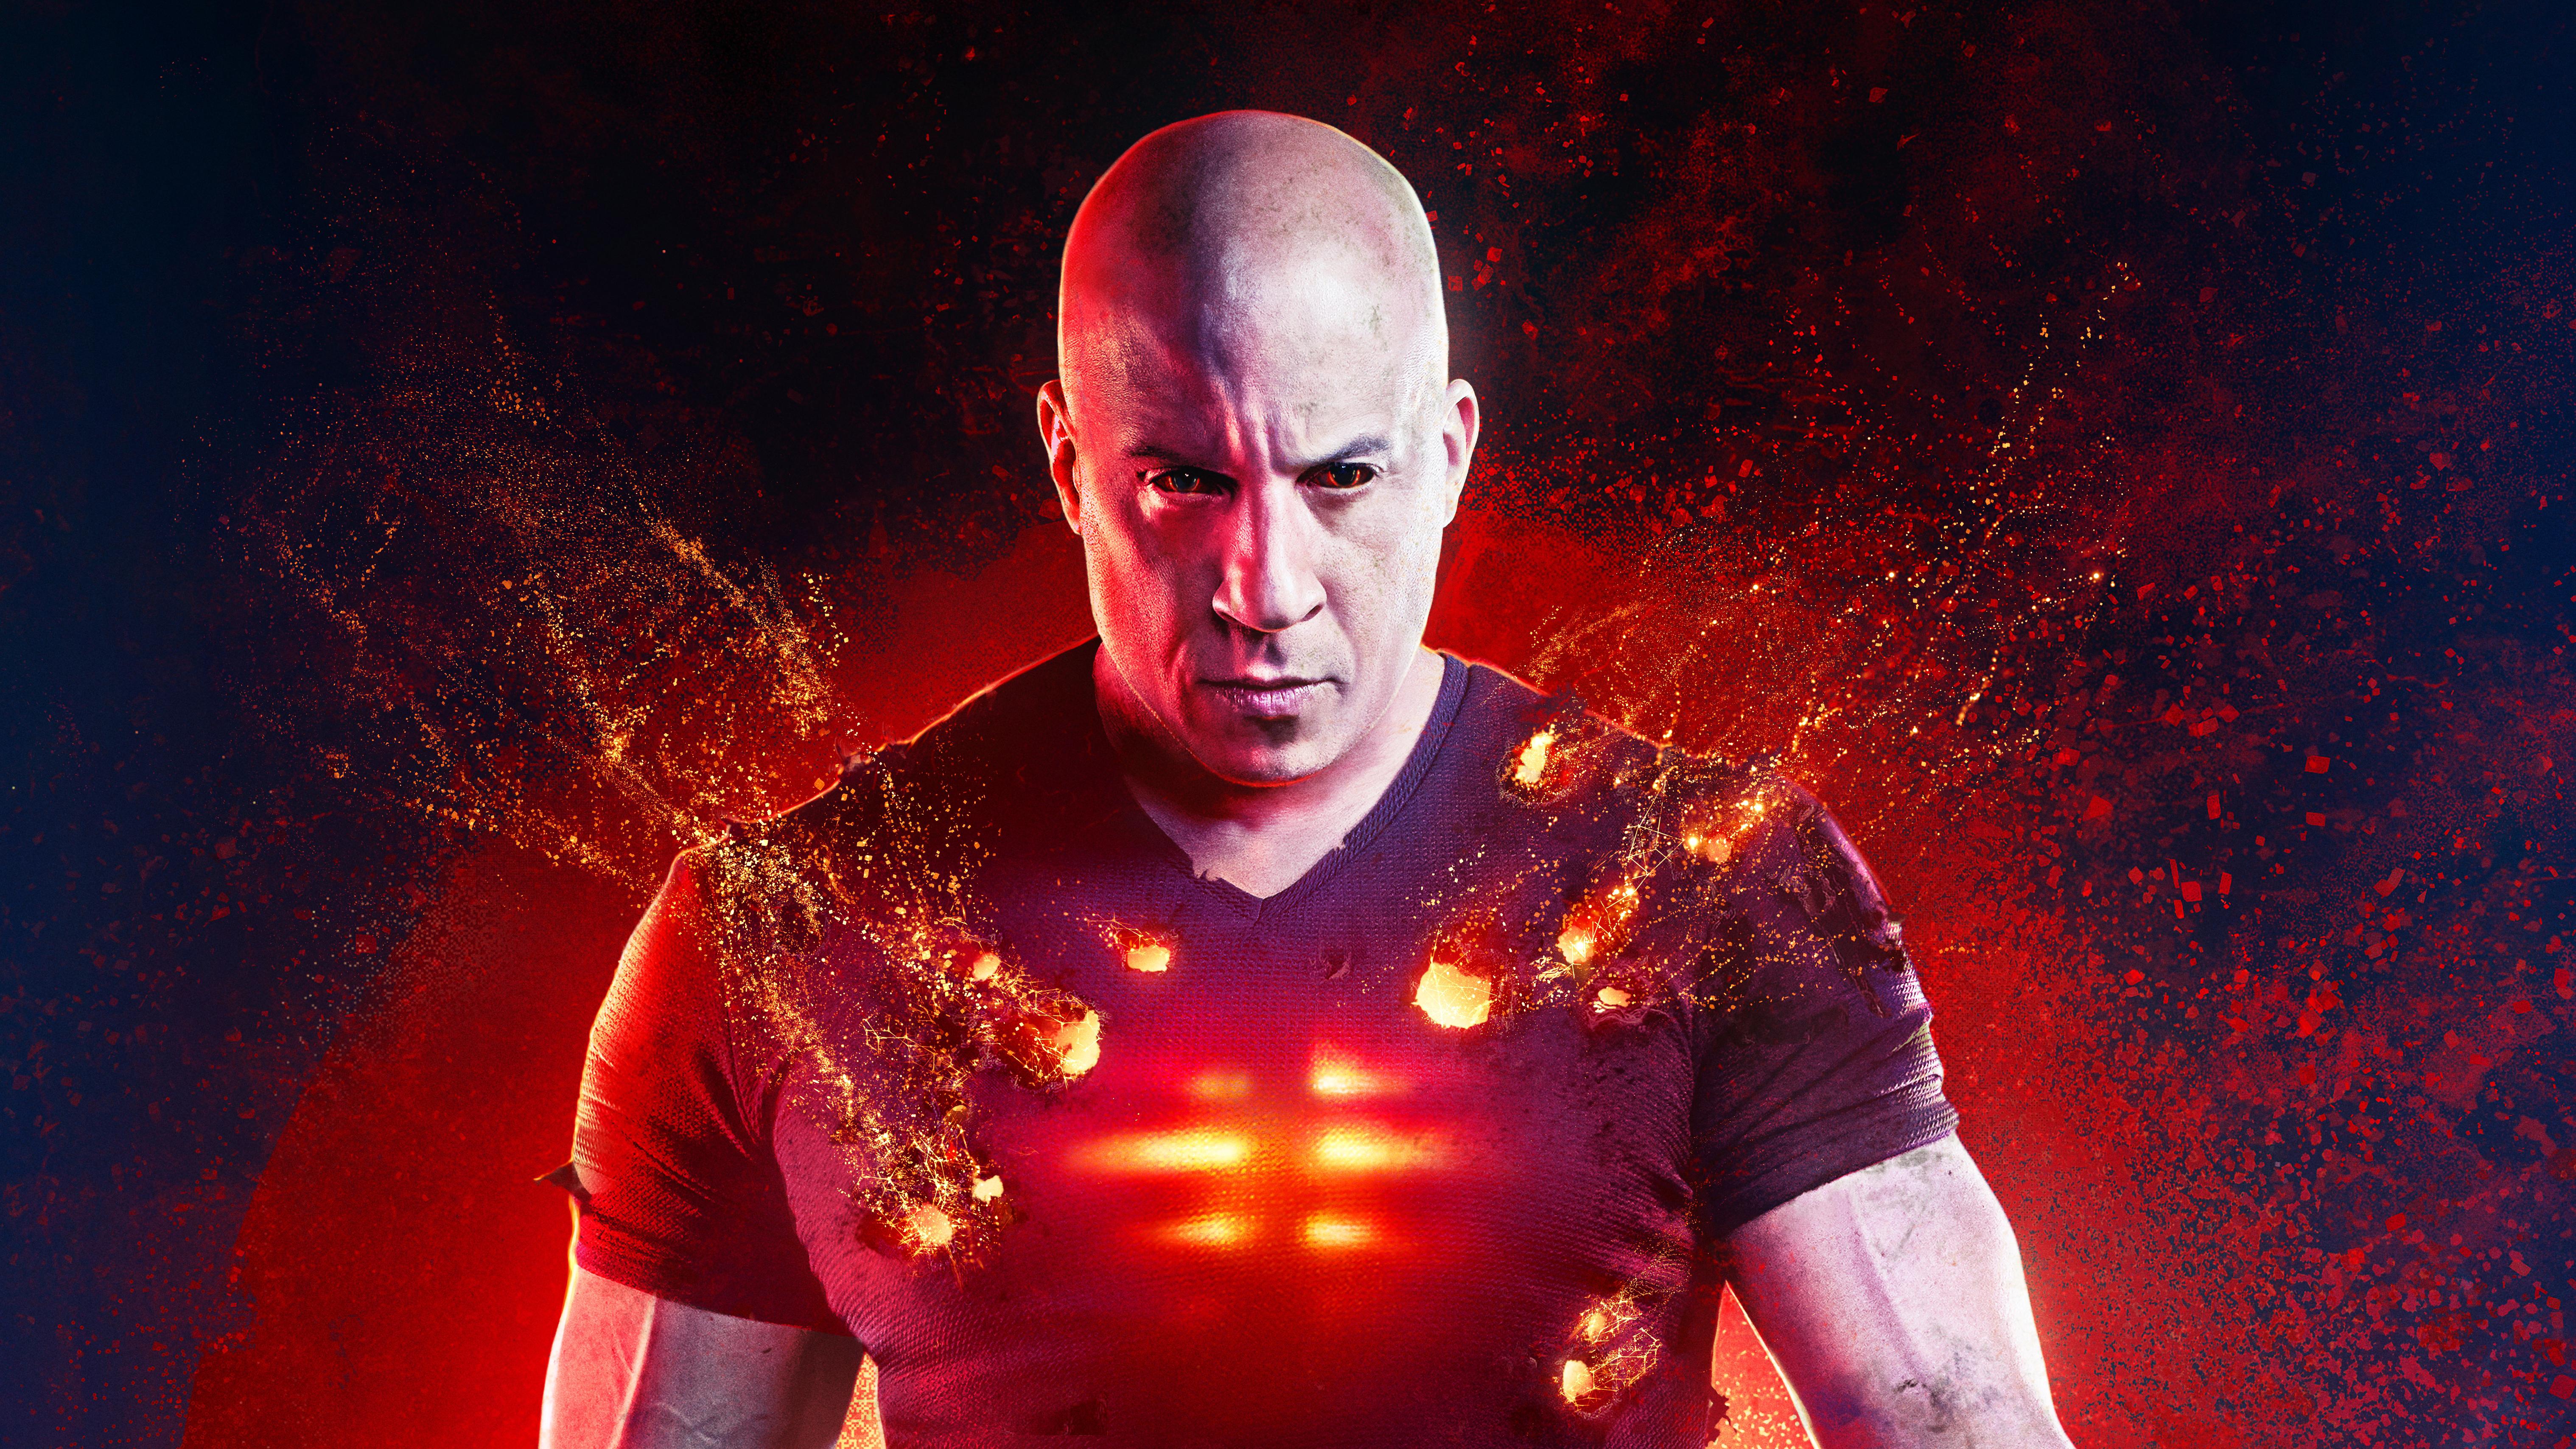 bloodshot movie 2020 1582151957 - Bloodshot Movie 2020 - Bloodshot Movie vin diesel wallpapers 4k, Bloodshot Movie 2020 wallpapers, Bloodshot 4k wallpapers